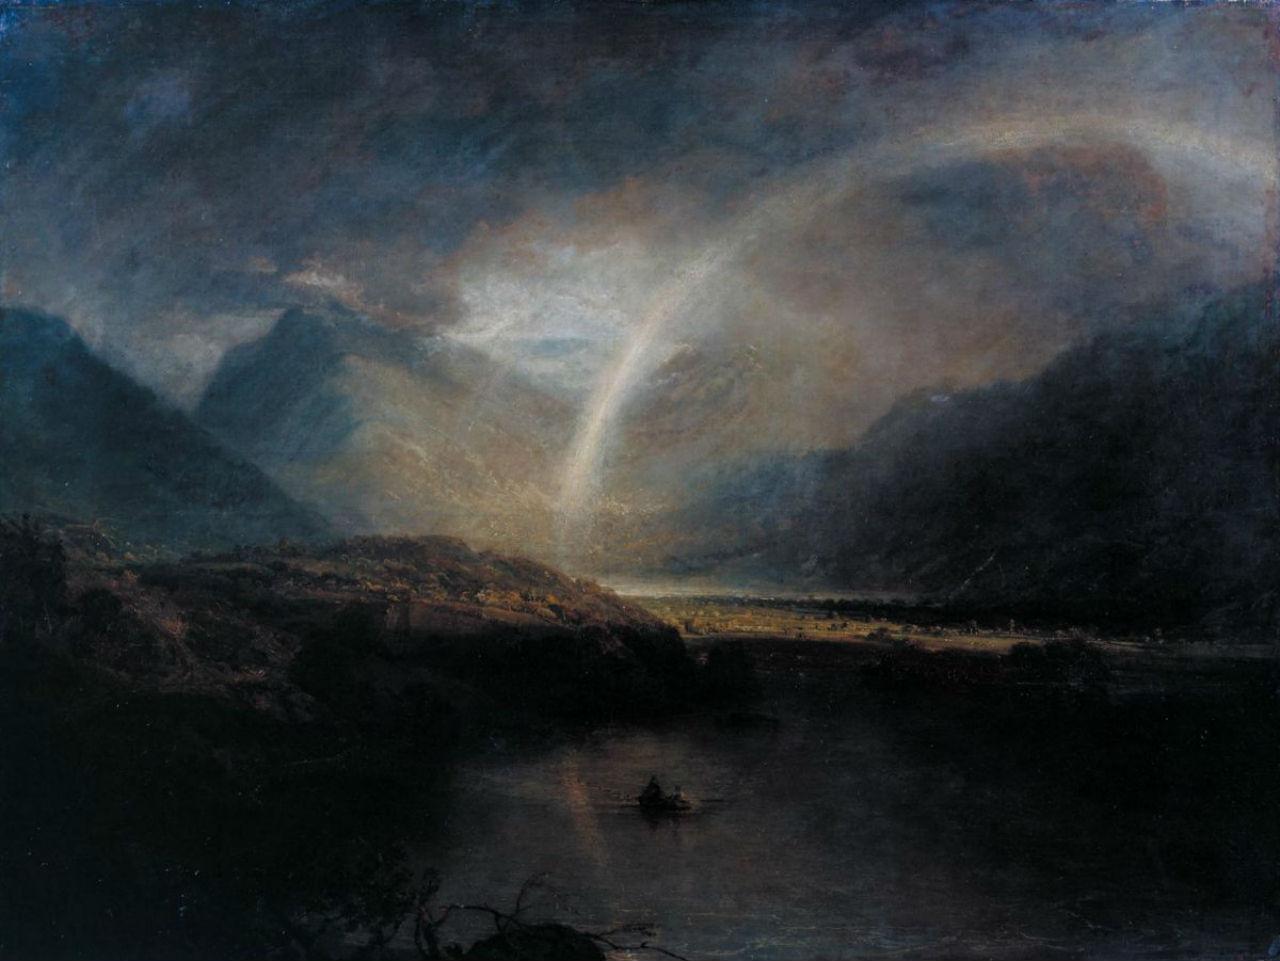 10-Джозеф Мэллорд Уильям Тёрнер - Озеро Баттермер с видом на Кромакуотер в Камберленде  ливень - 1798.jpg